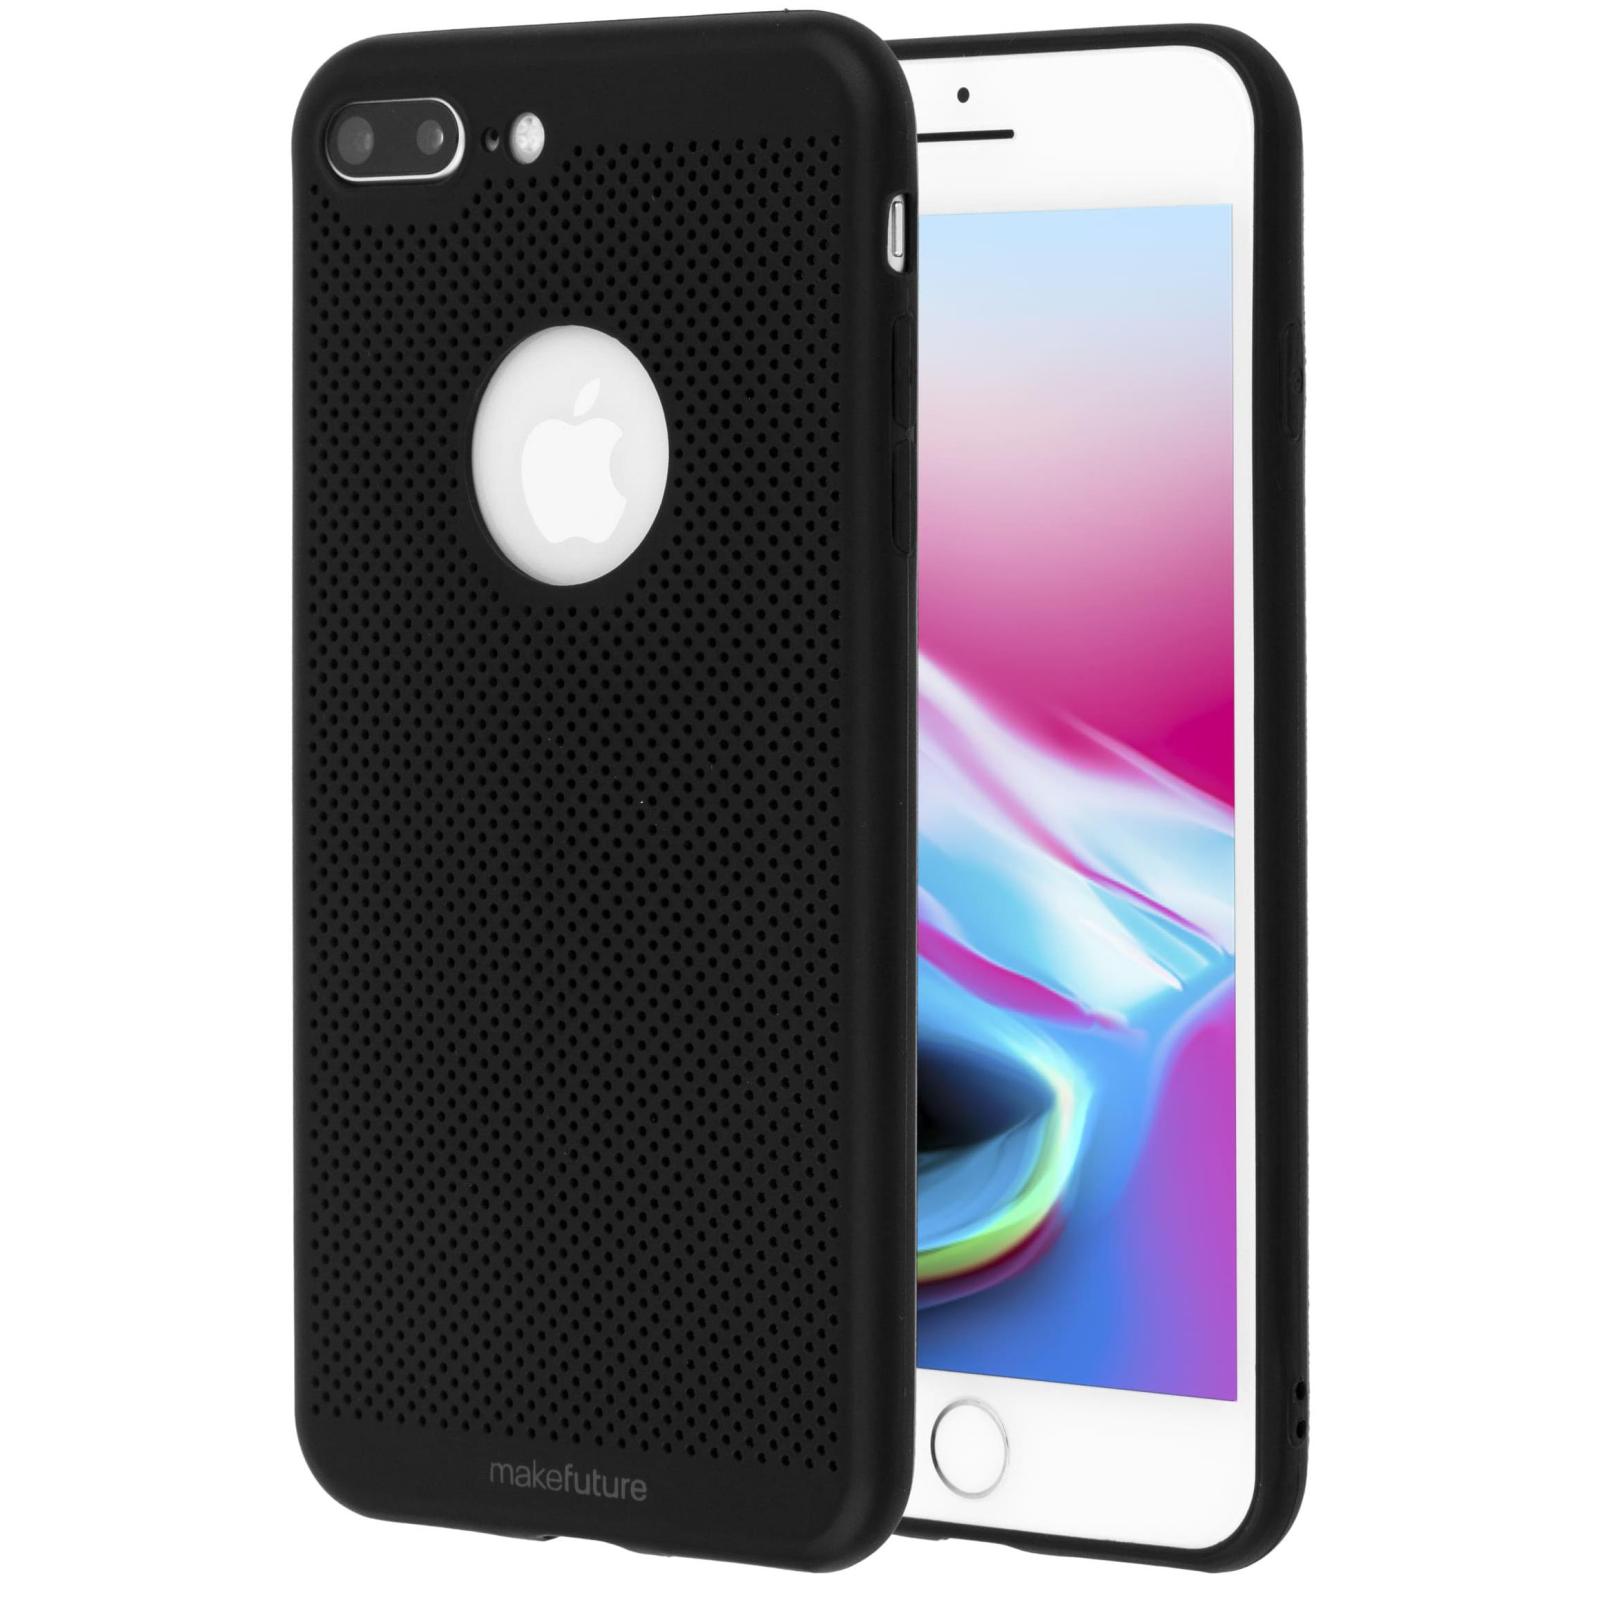 Чехол для моб. телефона MakeFuture Moon Case (TPU) для Apple iPhone 8 Plus Black (MCM-AI8PBK) изображение 2